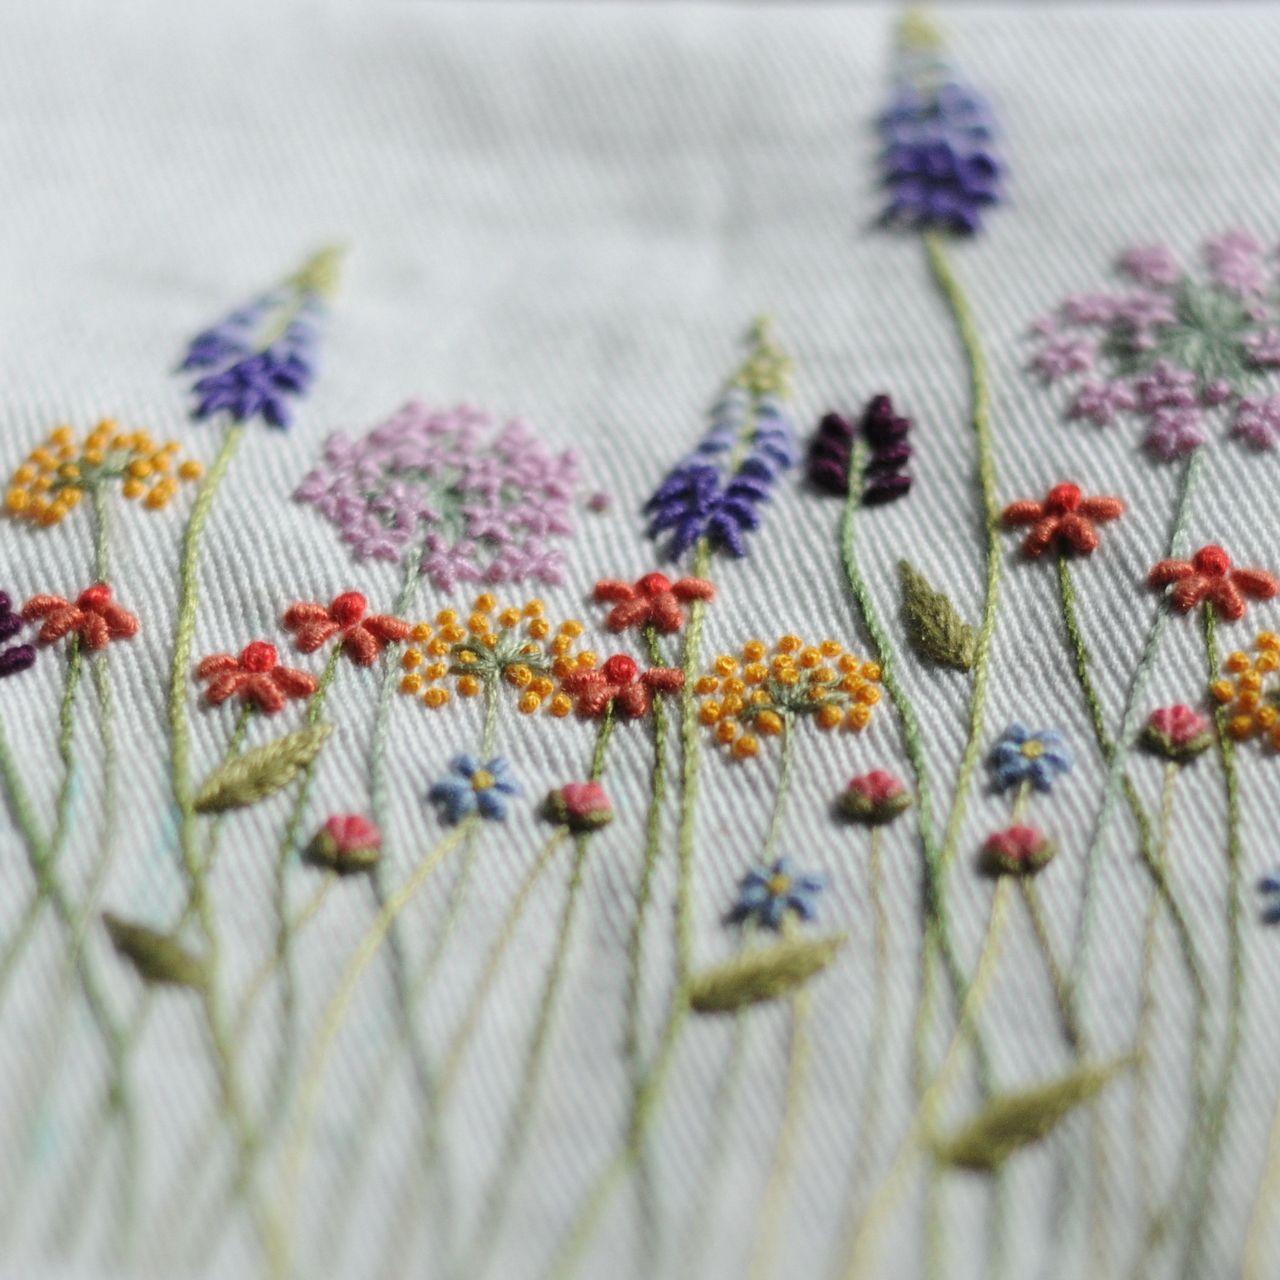 Sandra uchida sandra uchida pinterest embroidery and needlework